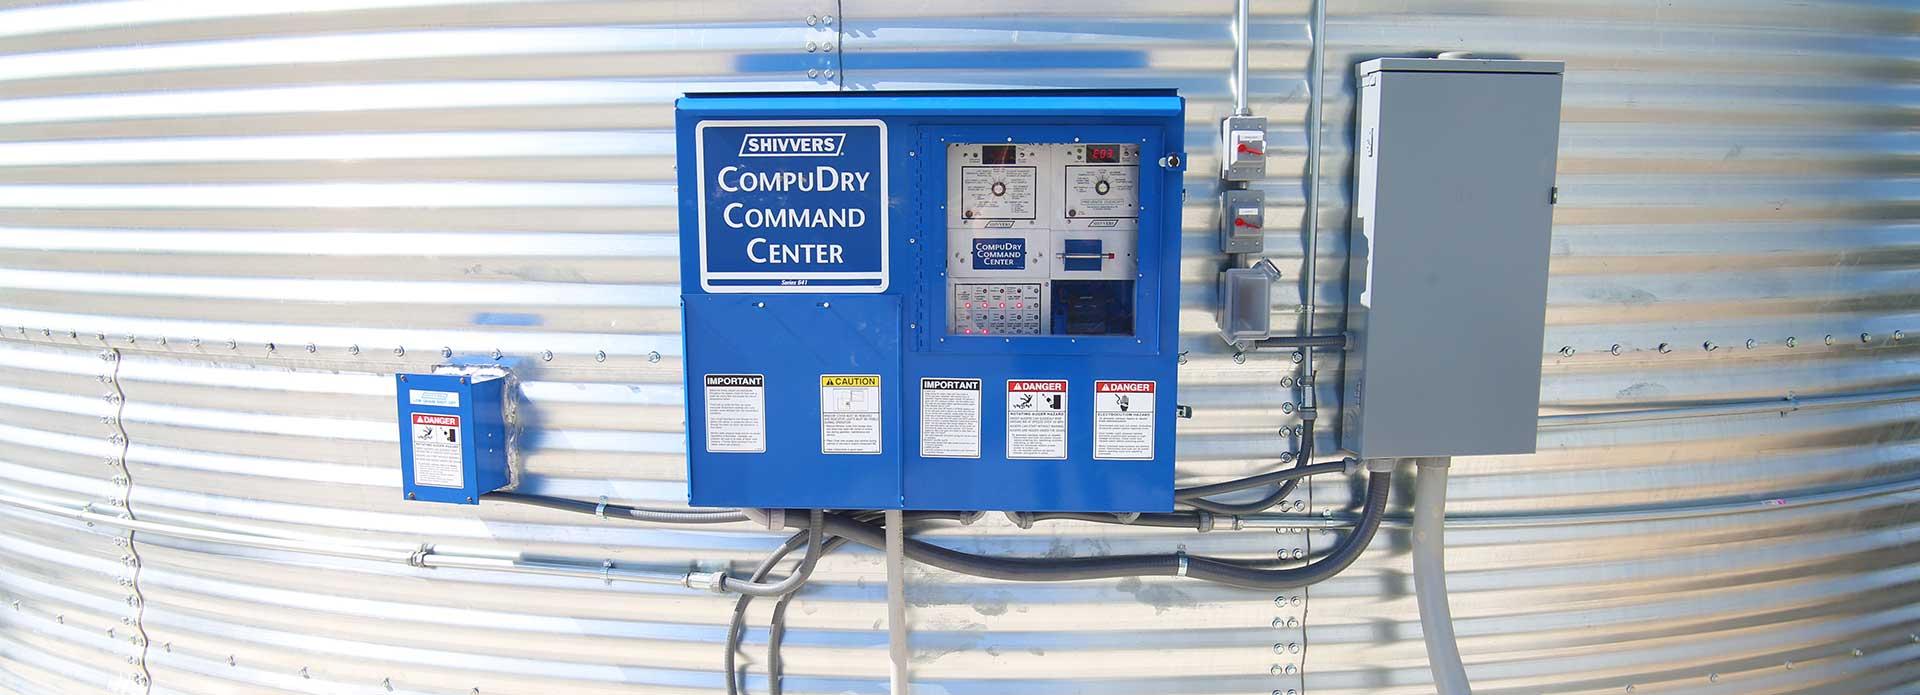 Eldon-C-Stutsman-Inc-Shivvers-Command-System